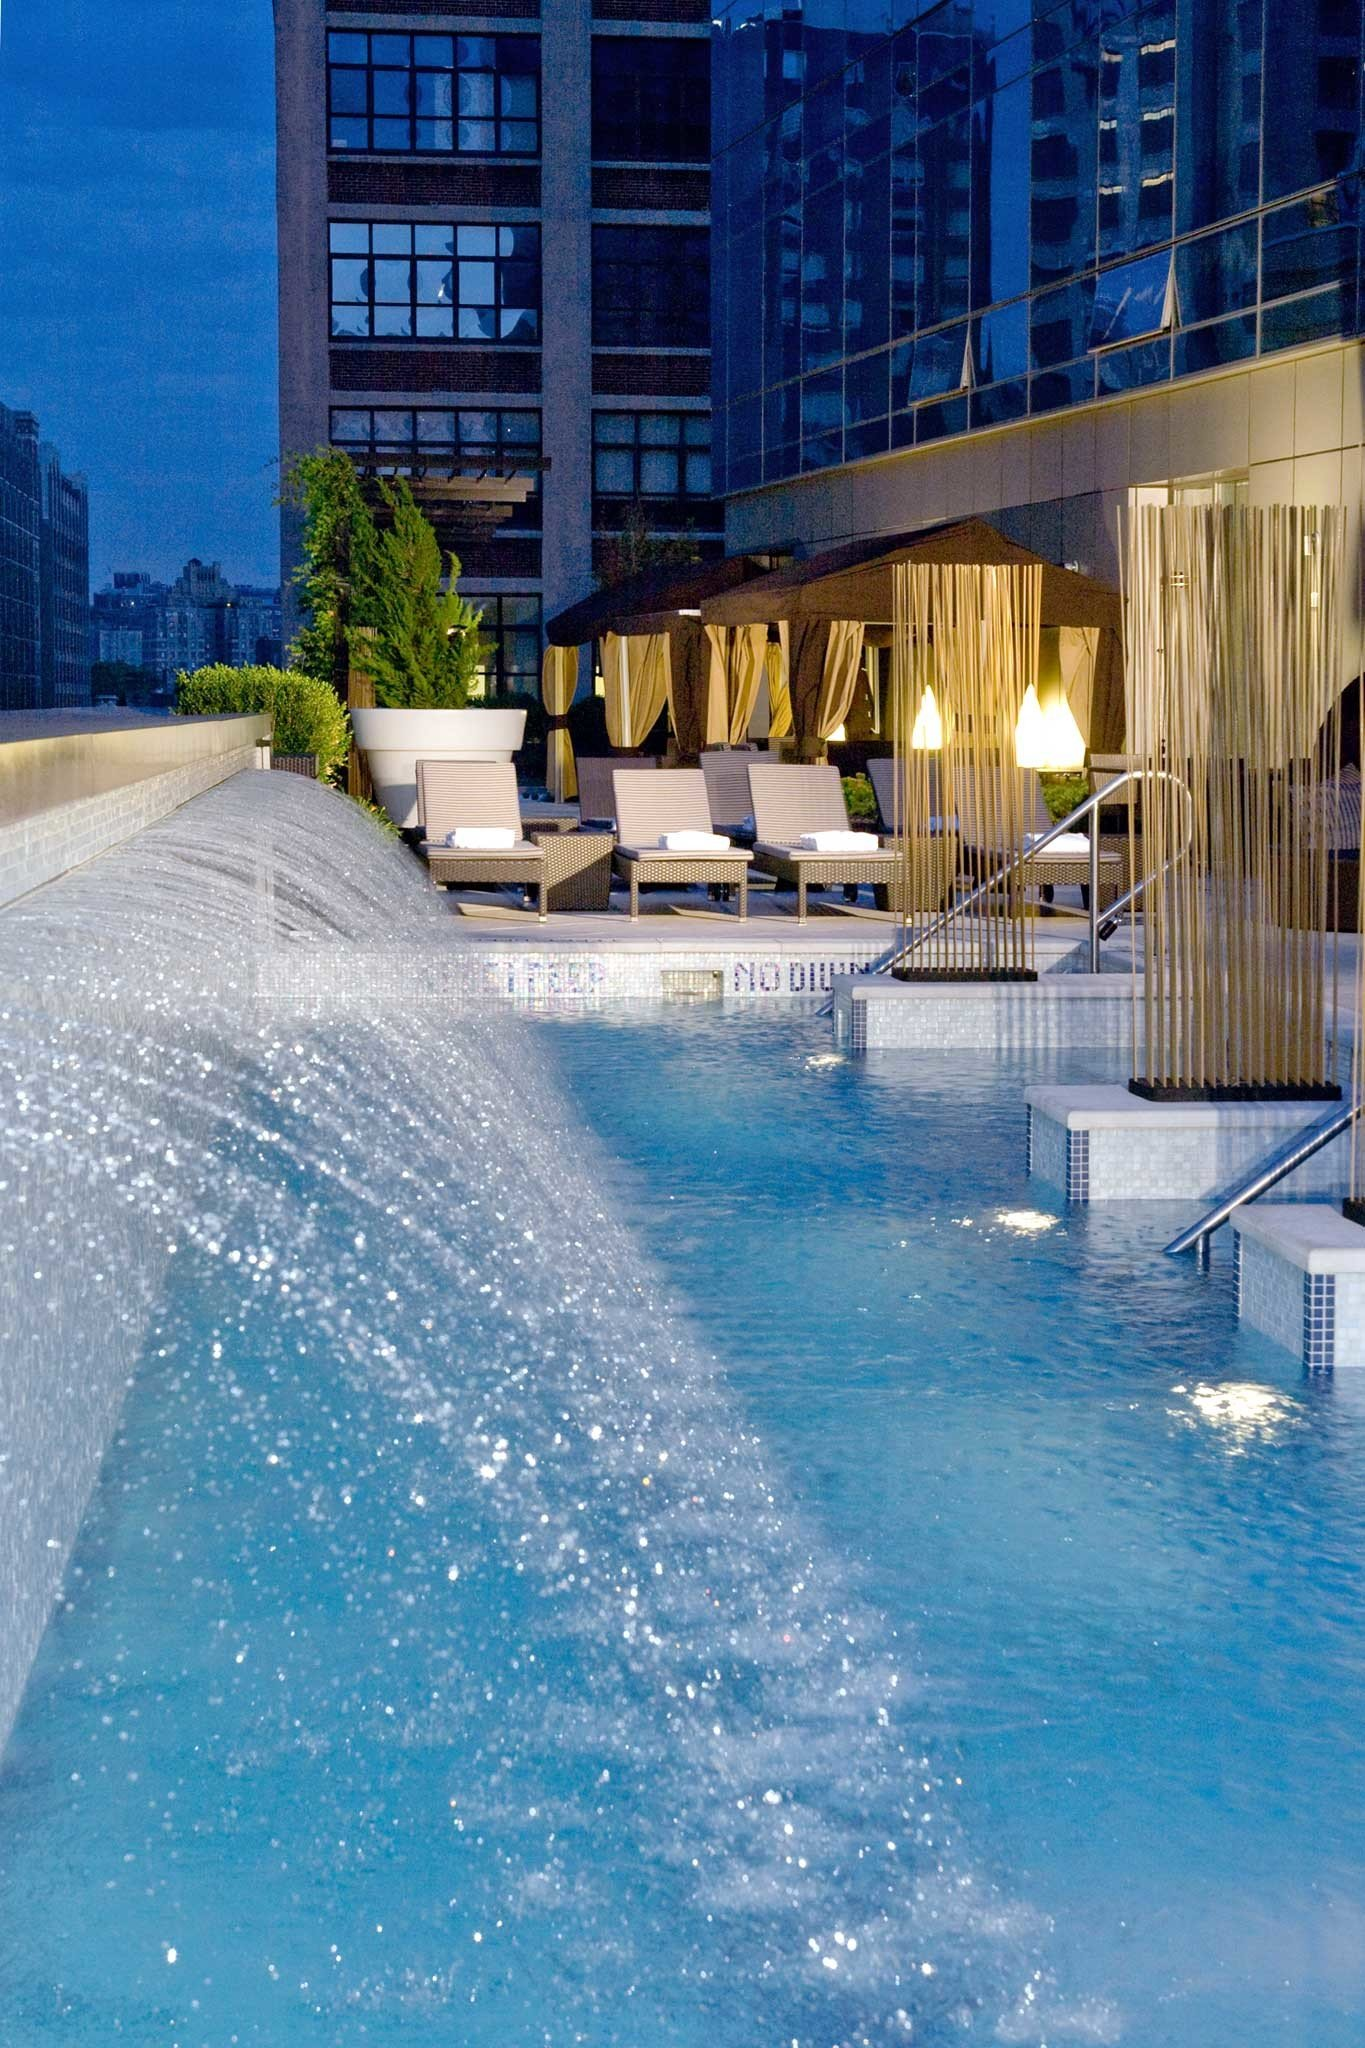 City Elegant Lounge Luxury Pool water swimming pool leisure reflecting pool water feature condominium Resort Water park